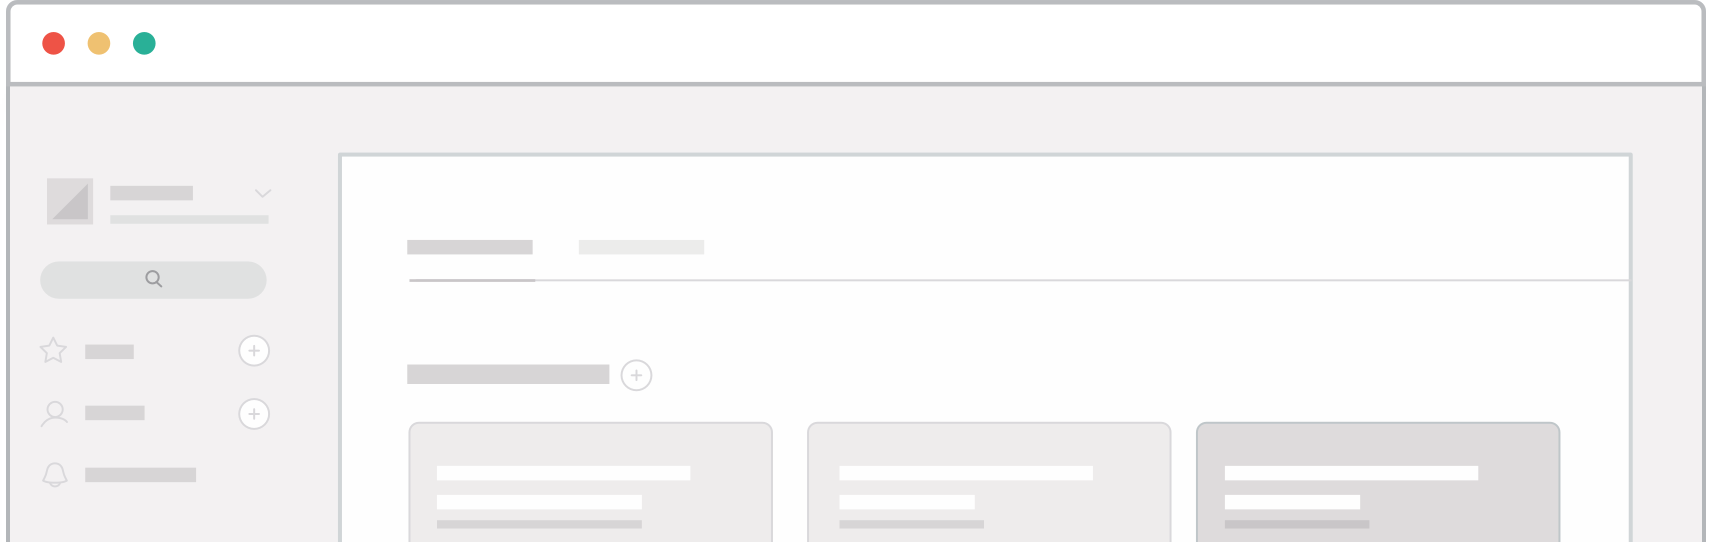 Faqbot Browser